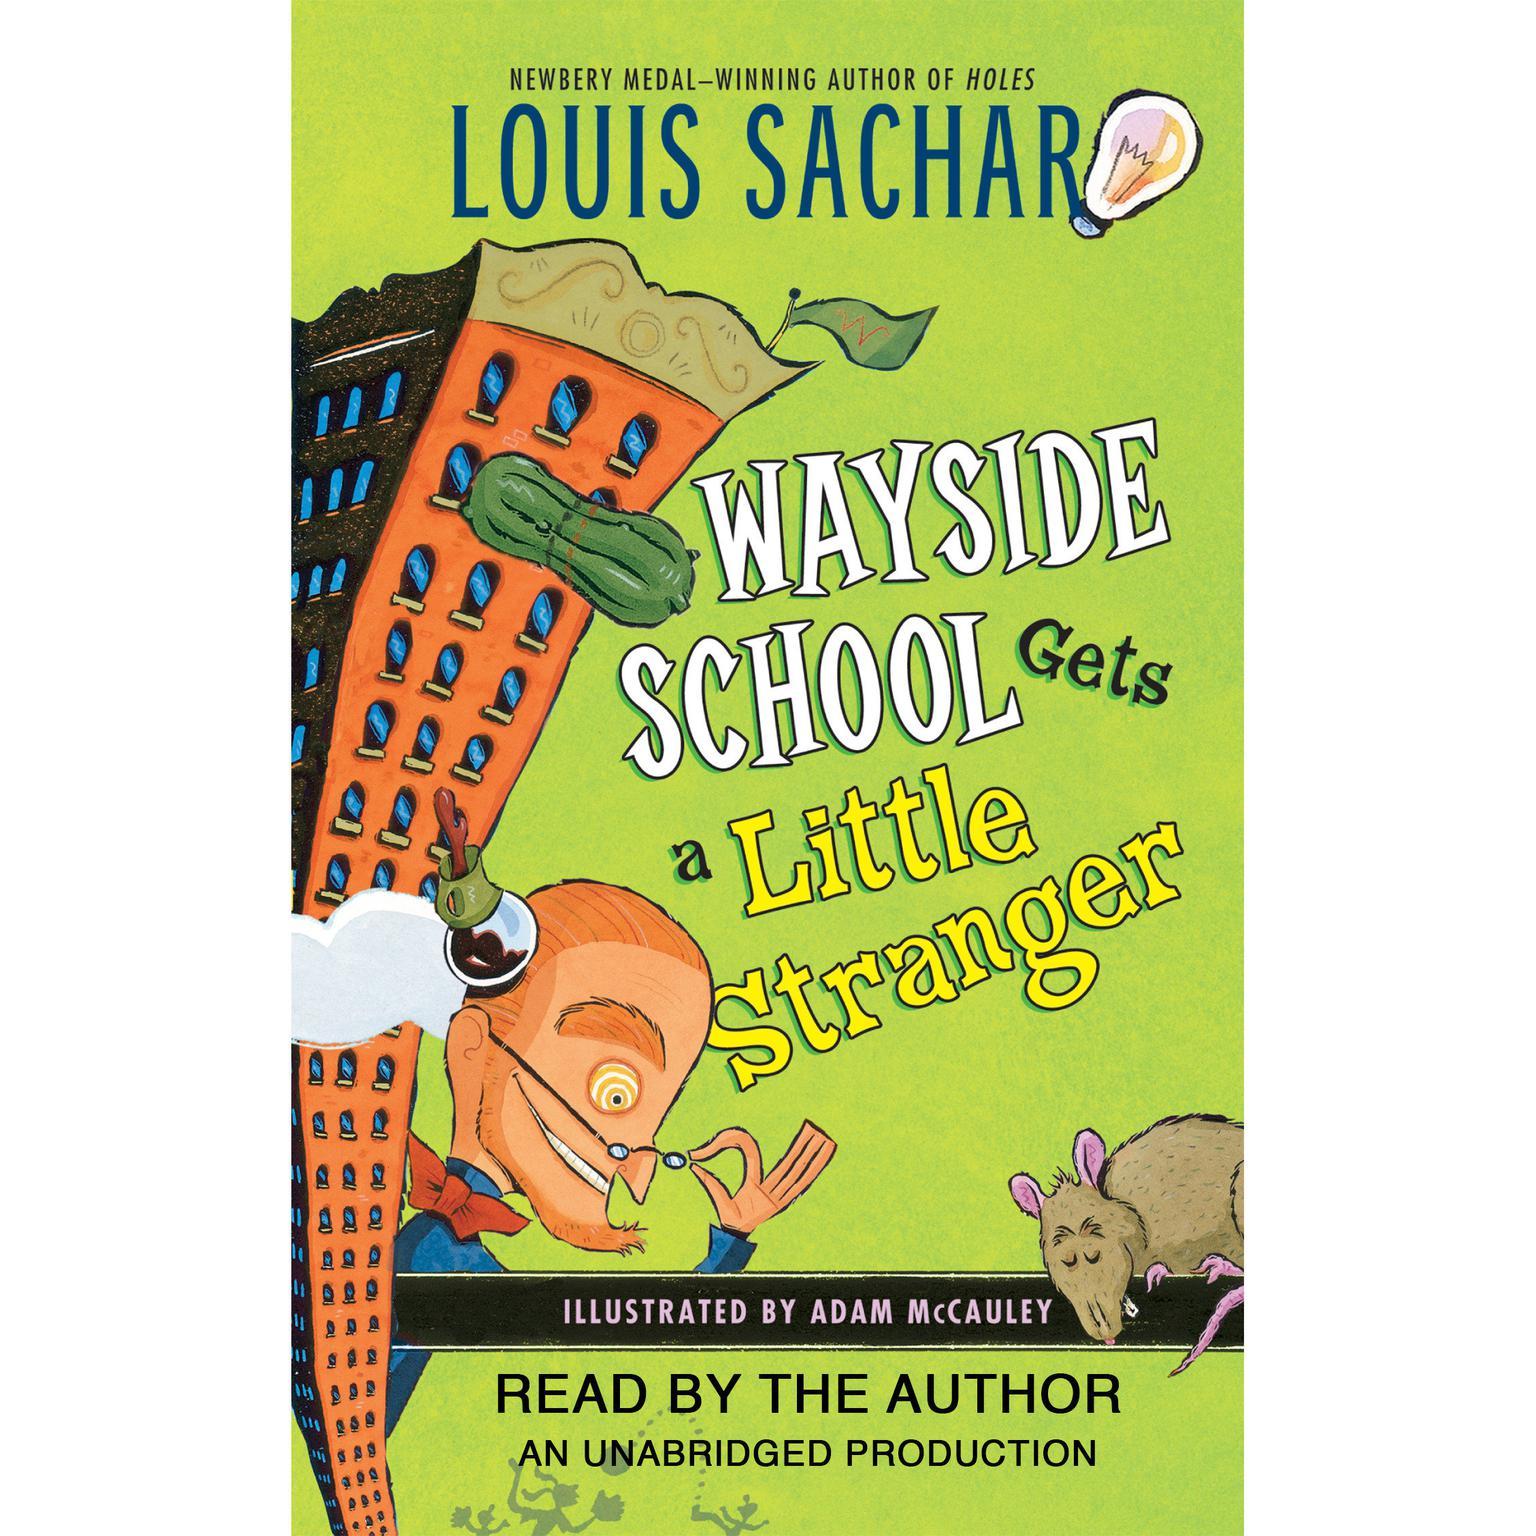 Wayside School Gets a Little Stranger Audiobook, by Louis Sachar